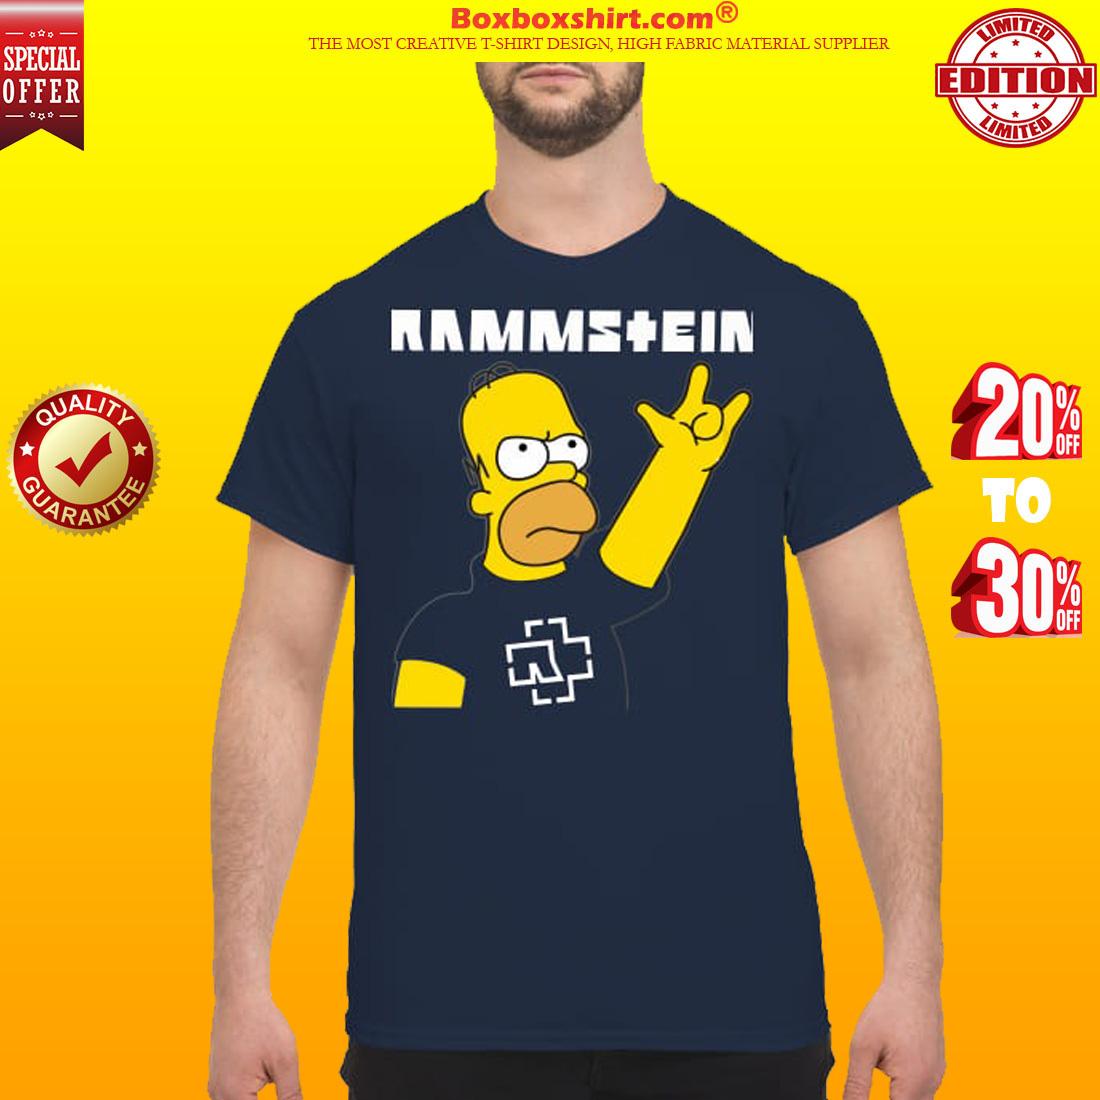 Homer simpson rammstein classic shirt